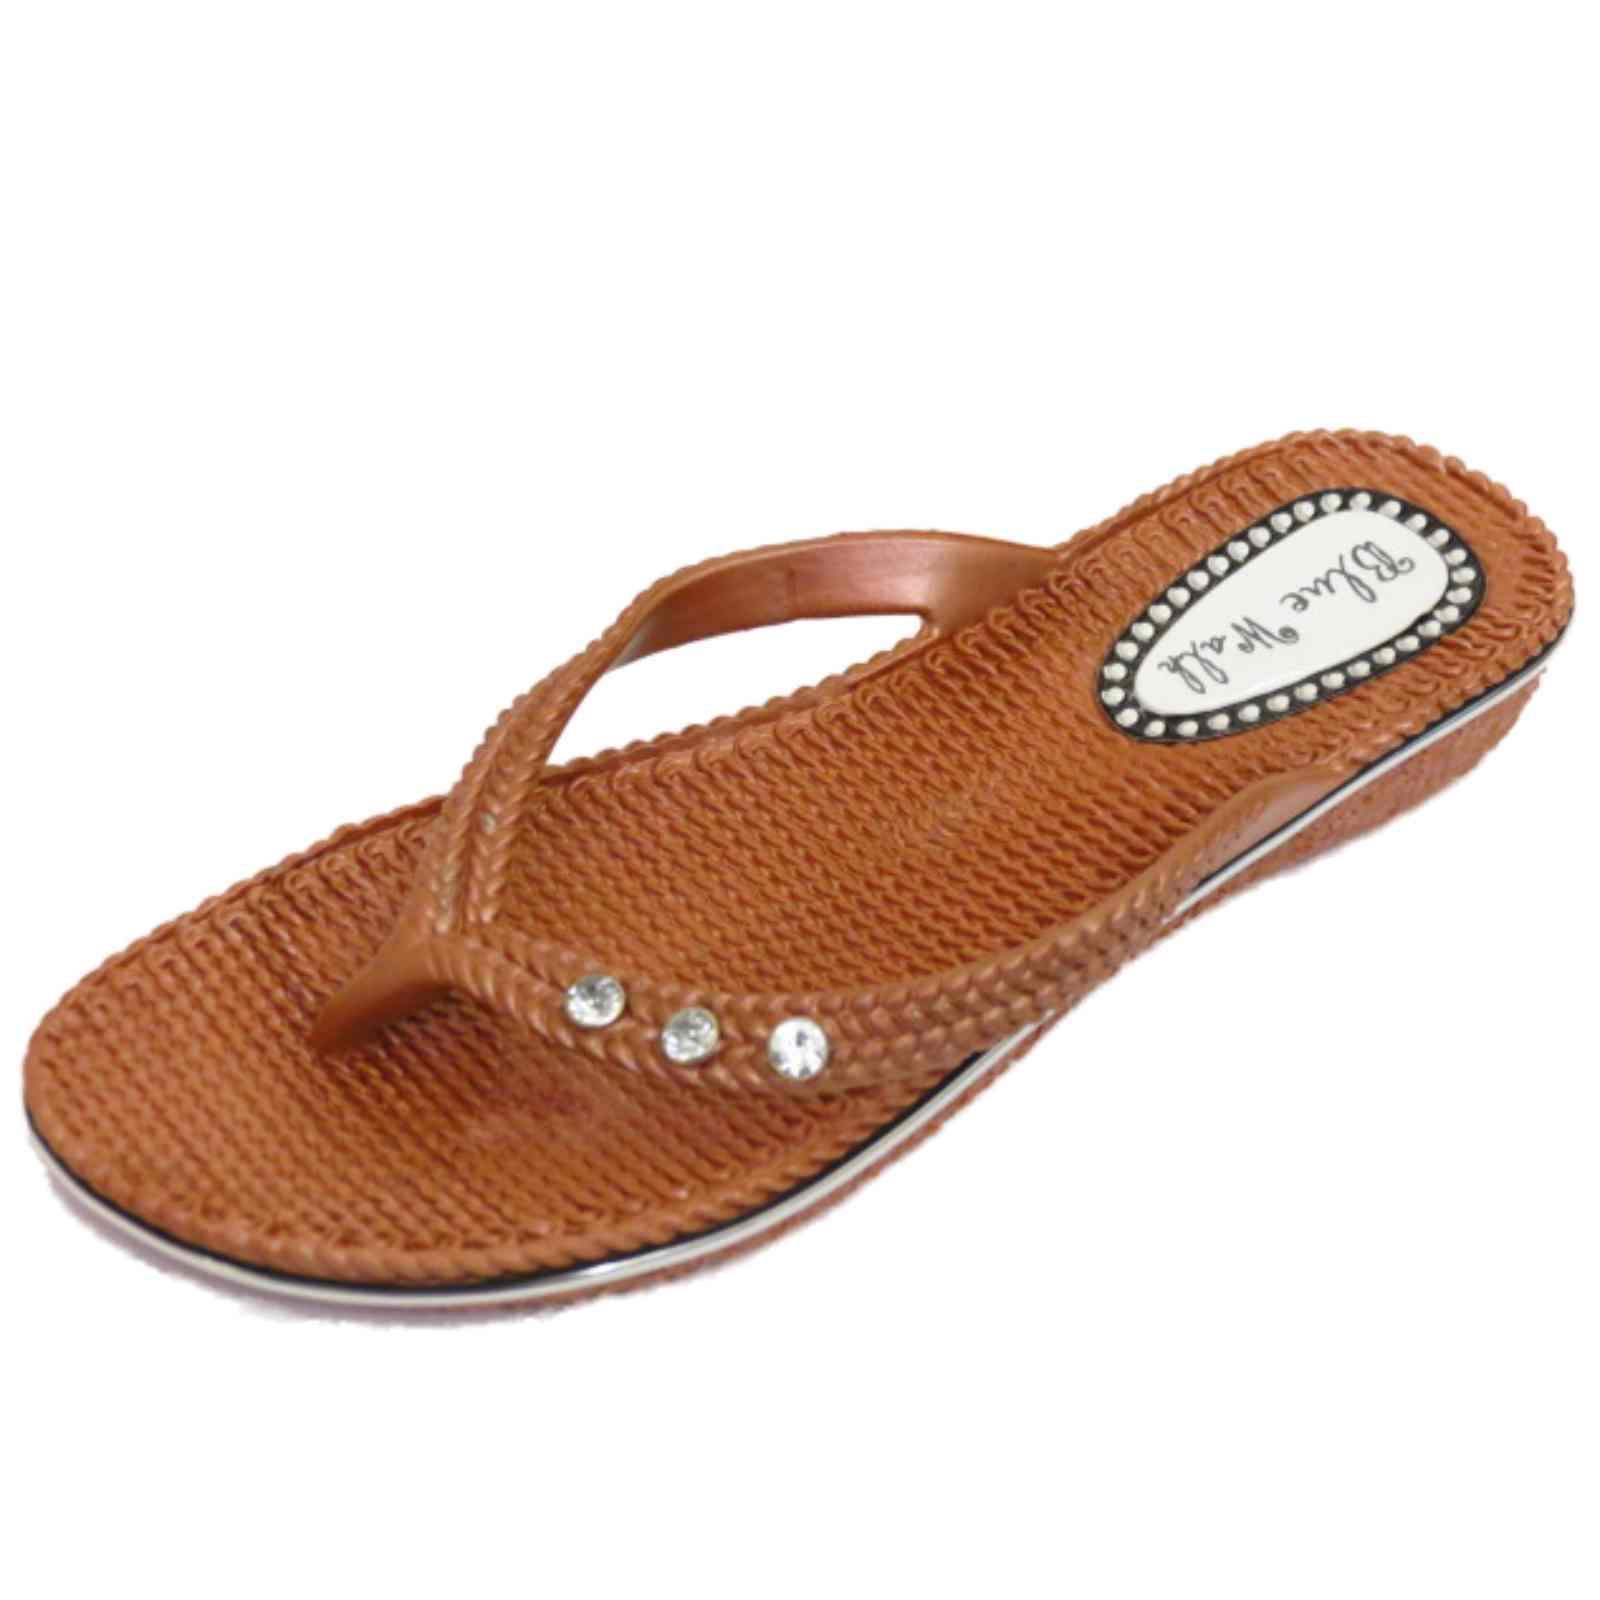 damen flach bronze zehensteg sandale flip flop strandurlaub tanga sommer schuhe ebay. Black Bedroom Furniture Sets. Home Design Ideas